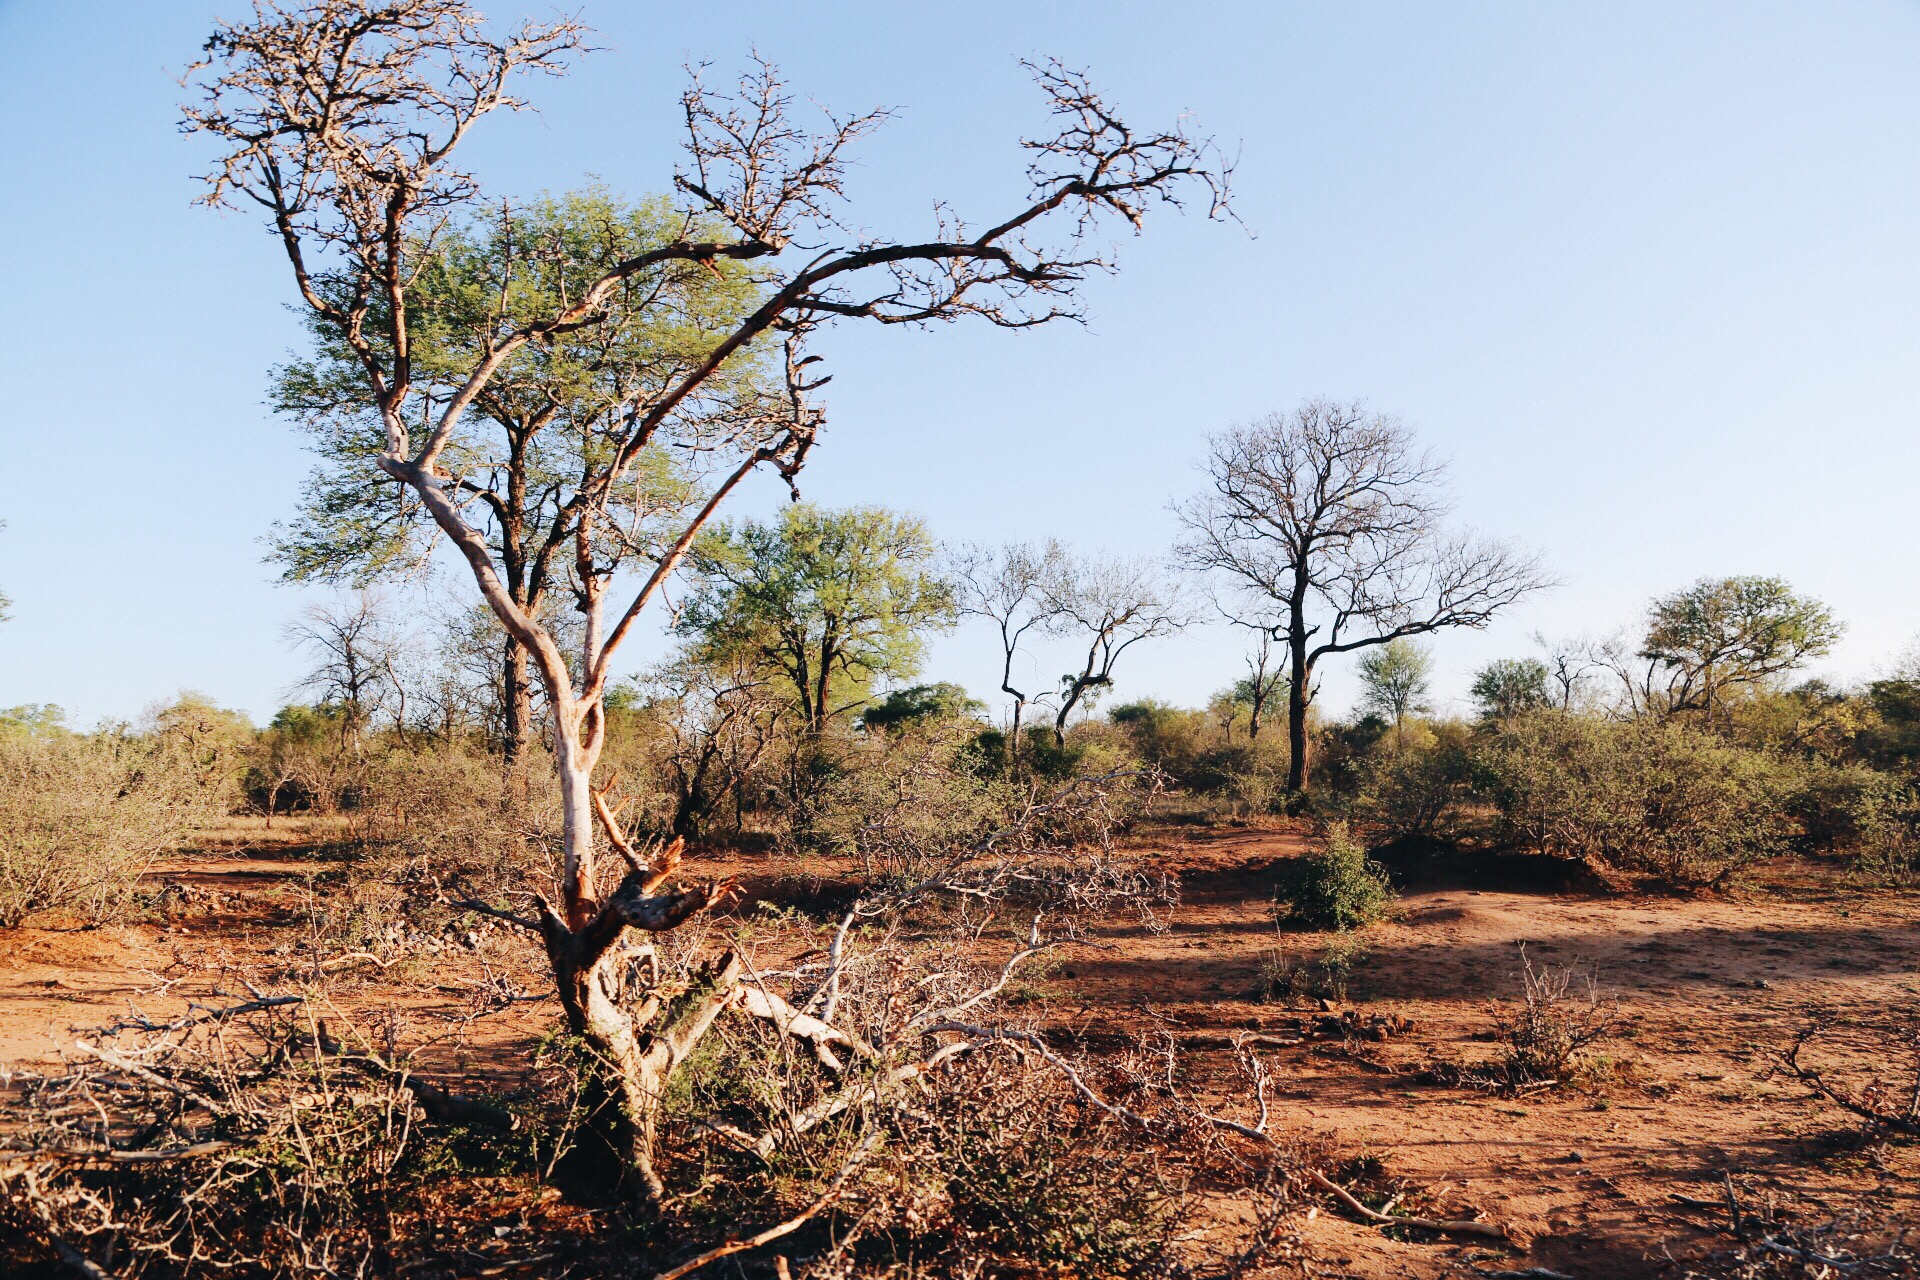 Safari In South Africa - A Photo Diary (17)